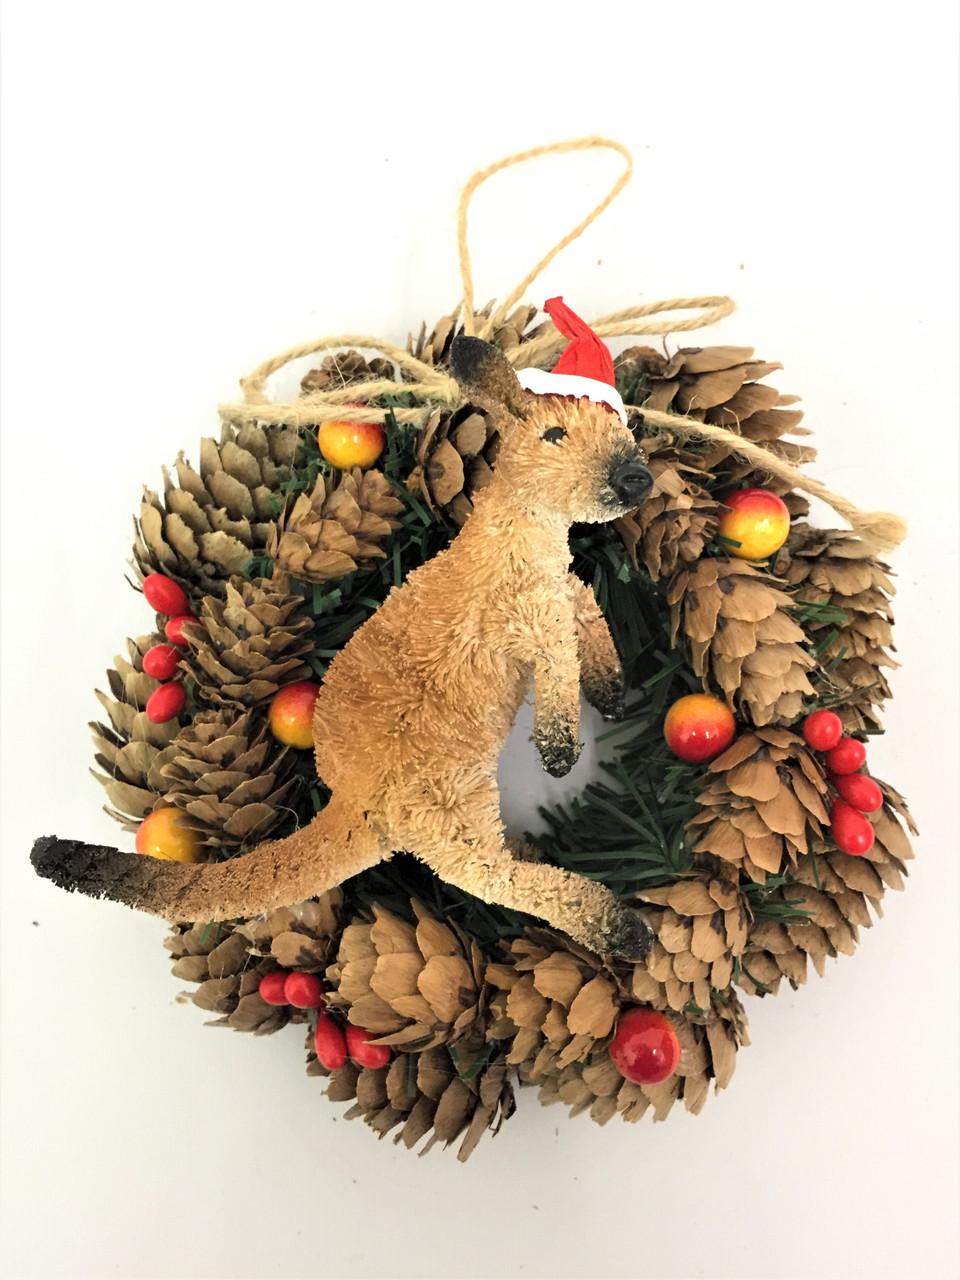 Kangaroo Pinecone Wreath - 14cm  Beautifully Handcrafted Pinecone Wreath with Aussie Kangaroo